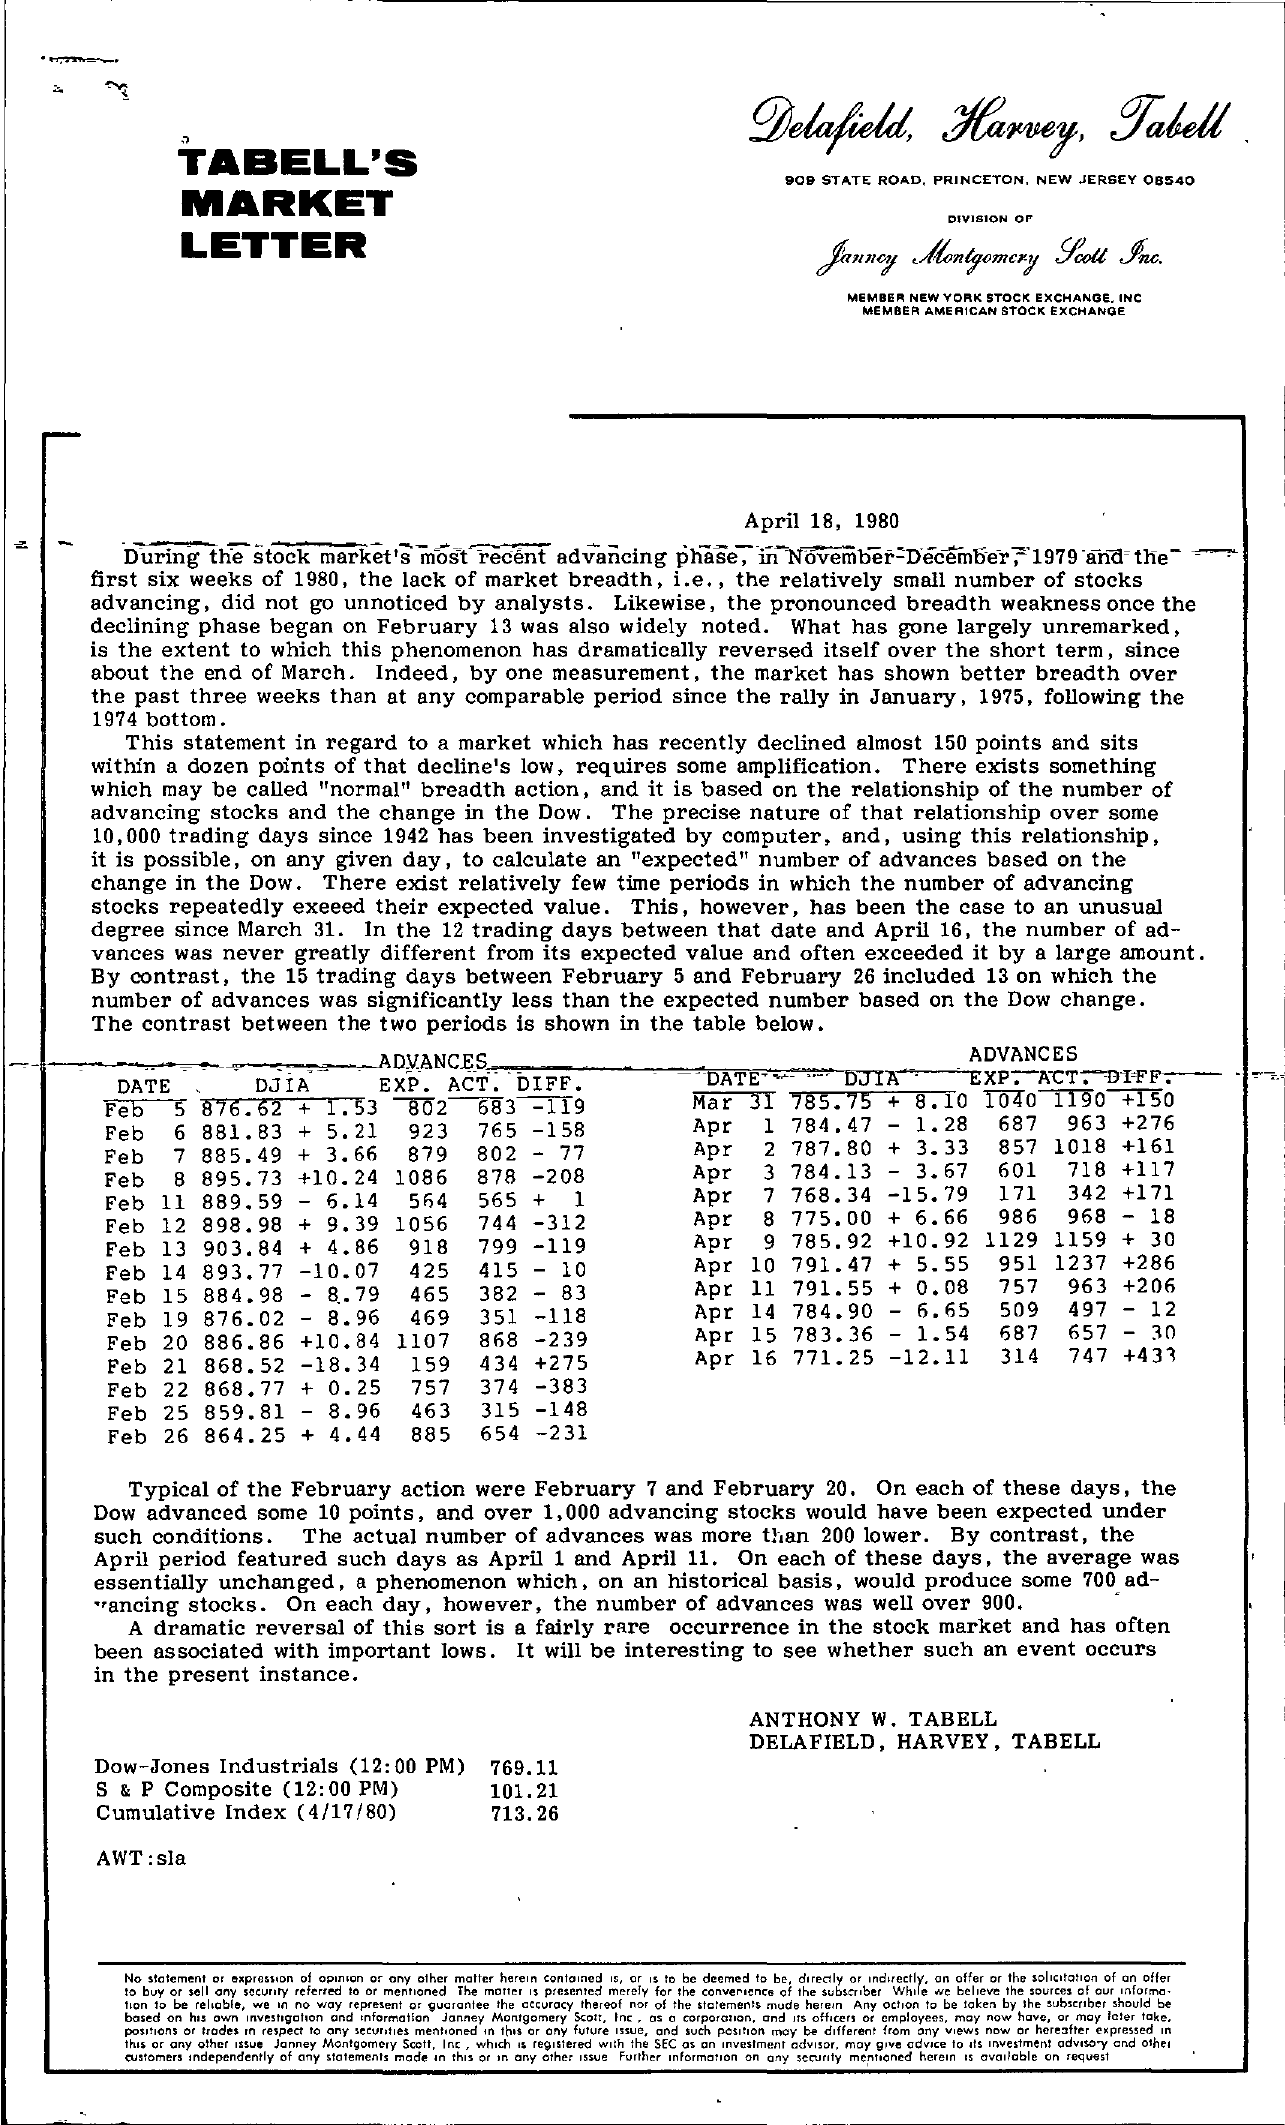 Tabell's Market Letter - April 18, 1980